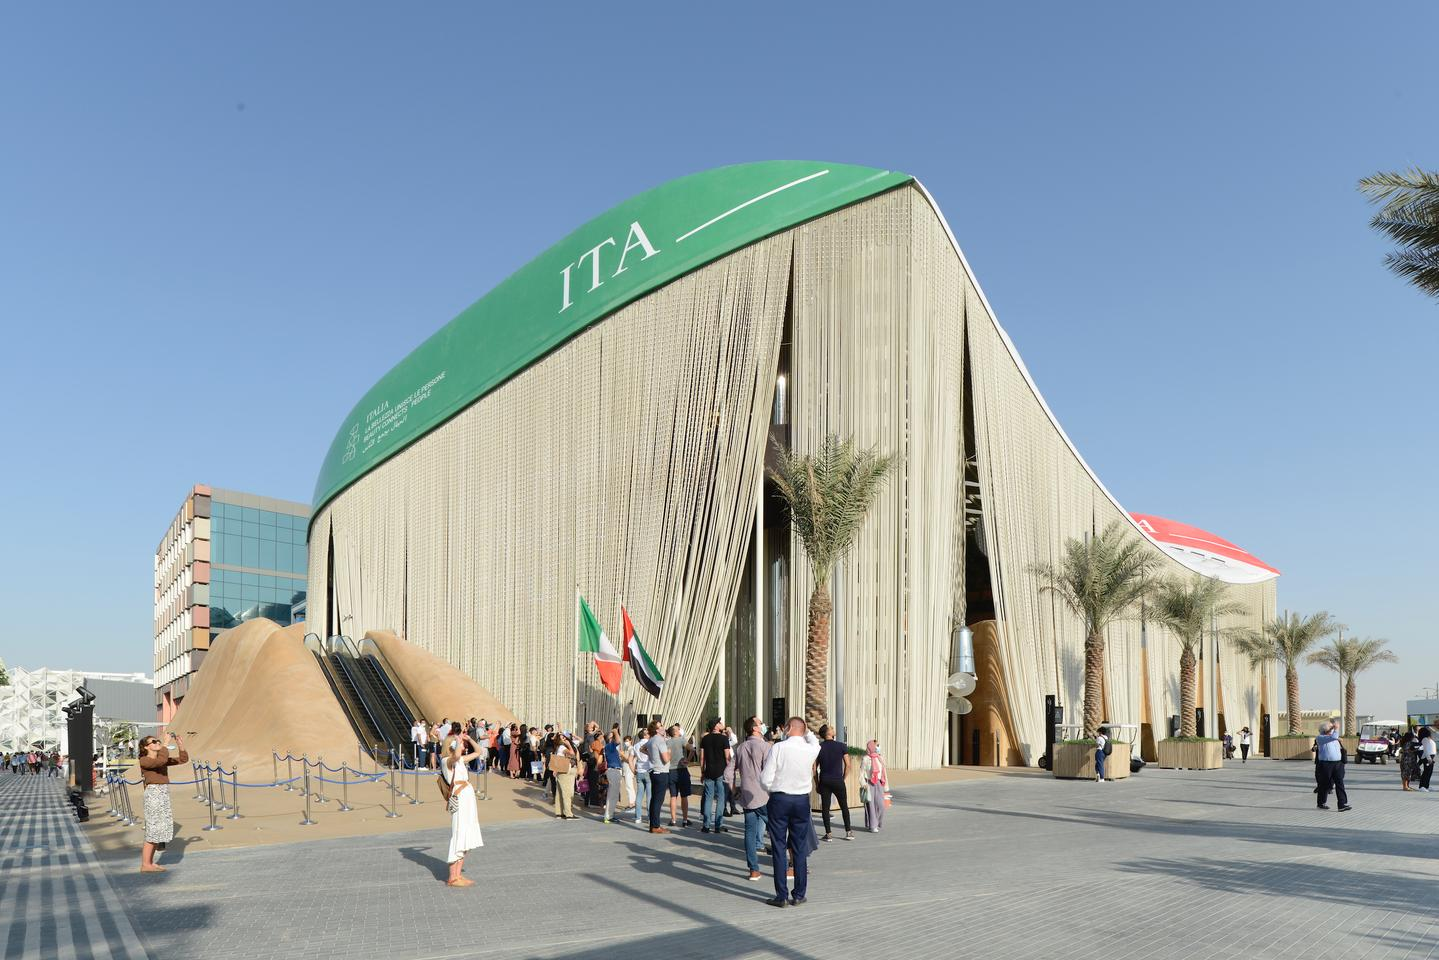 The Italian Pavilion building at Expo Dubai 2020 was constructed using three boat hulls